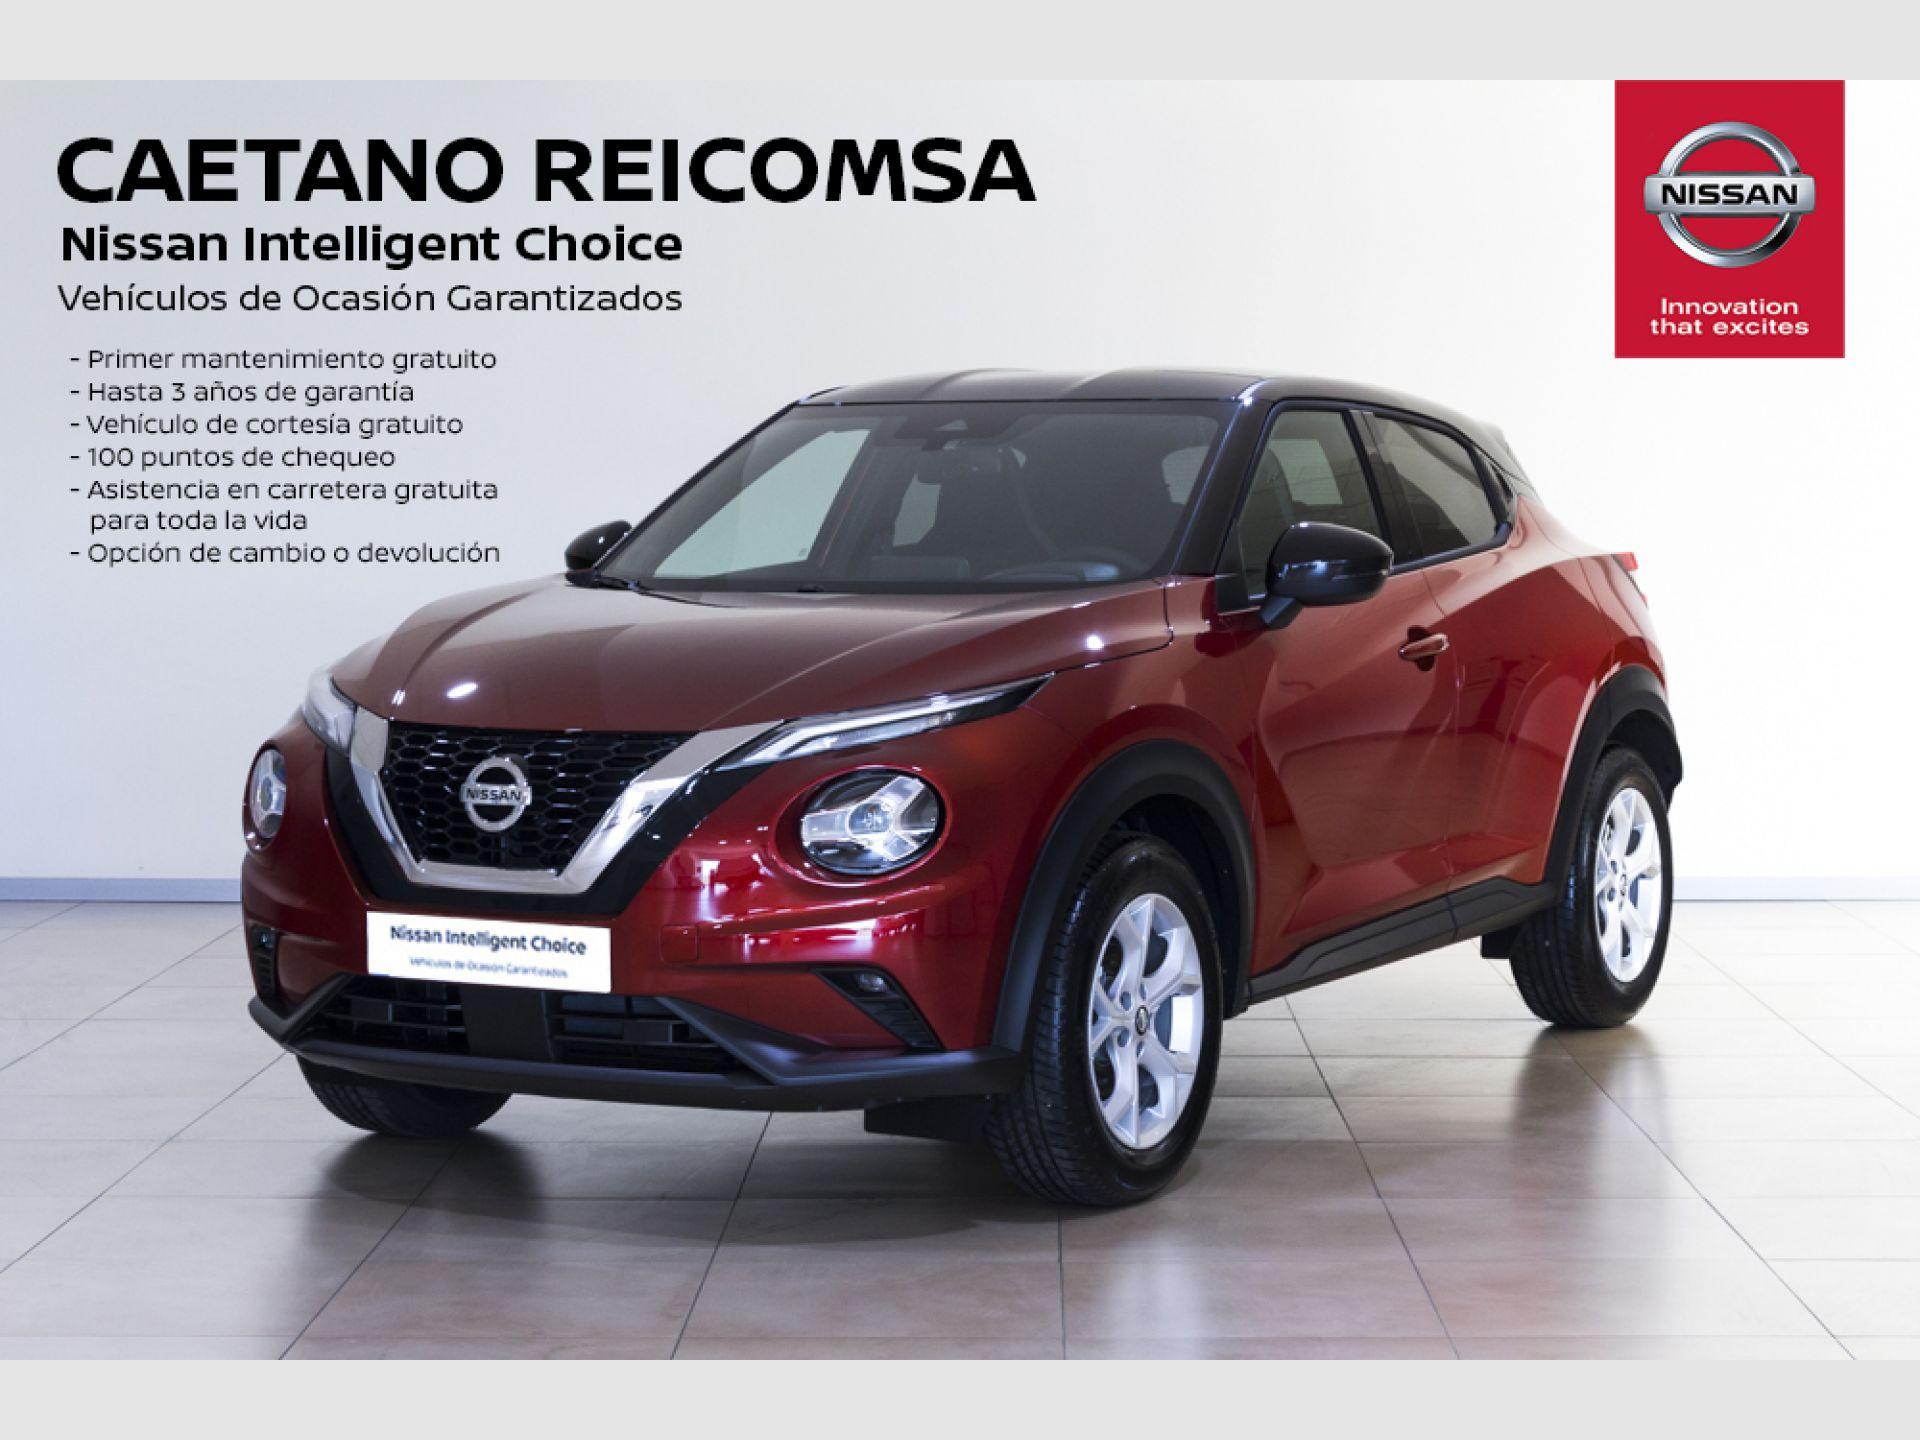 Nissan JUKE DIG-T 86 kW (117 CV) 6 M/T N-CONNECTA segunda mano Madrid